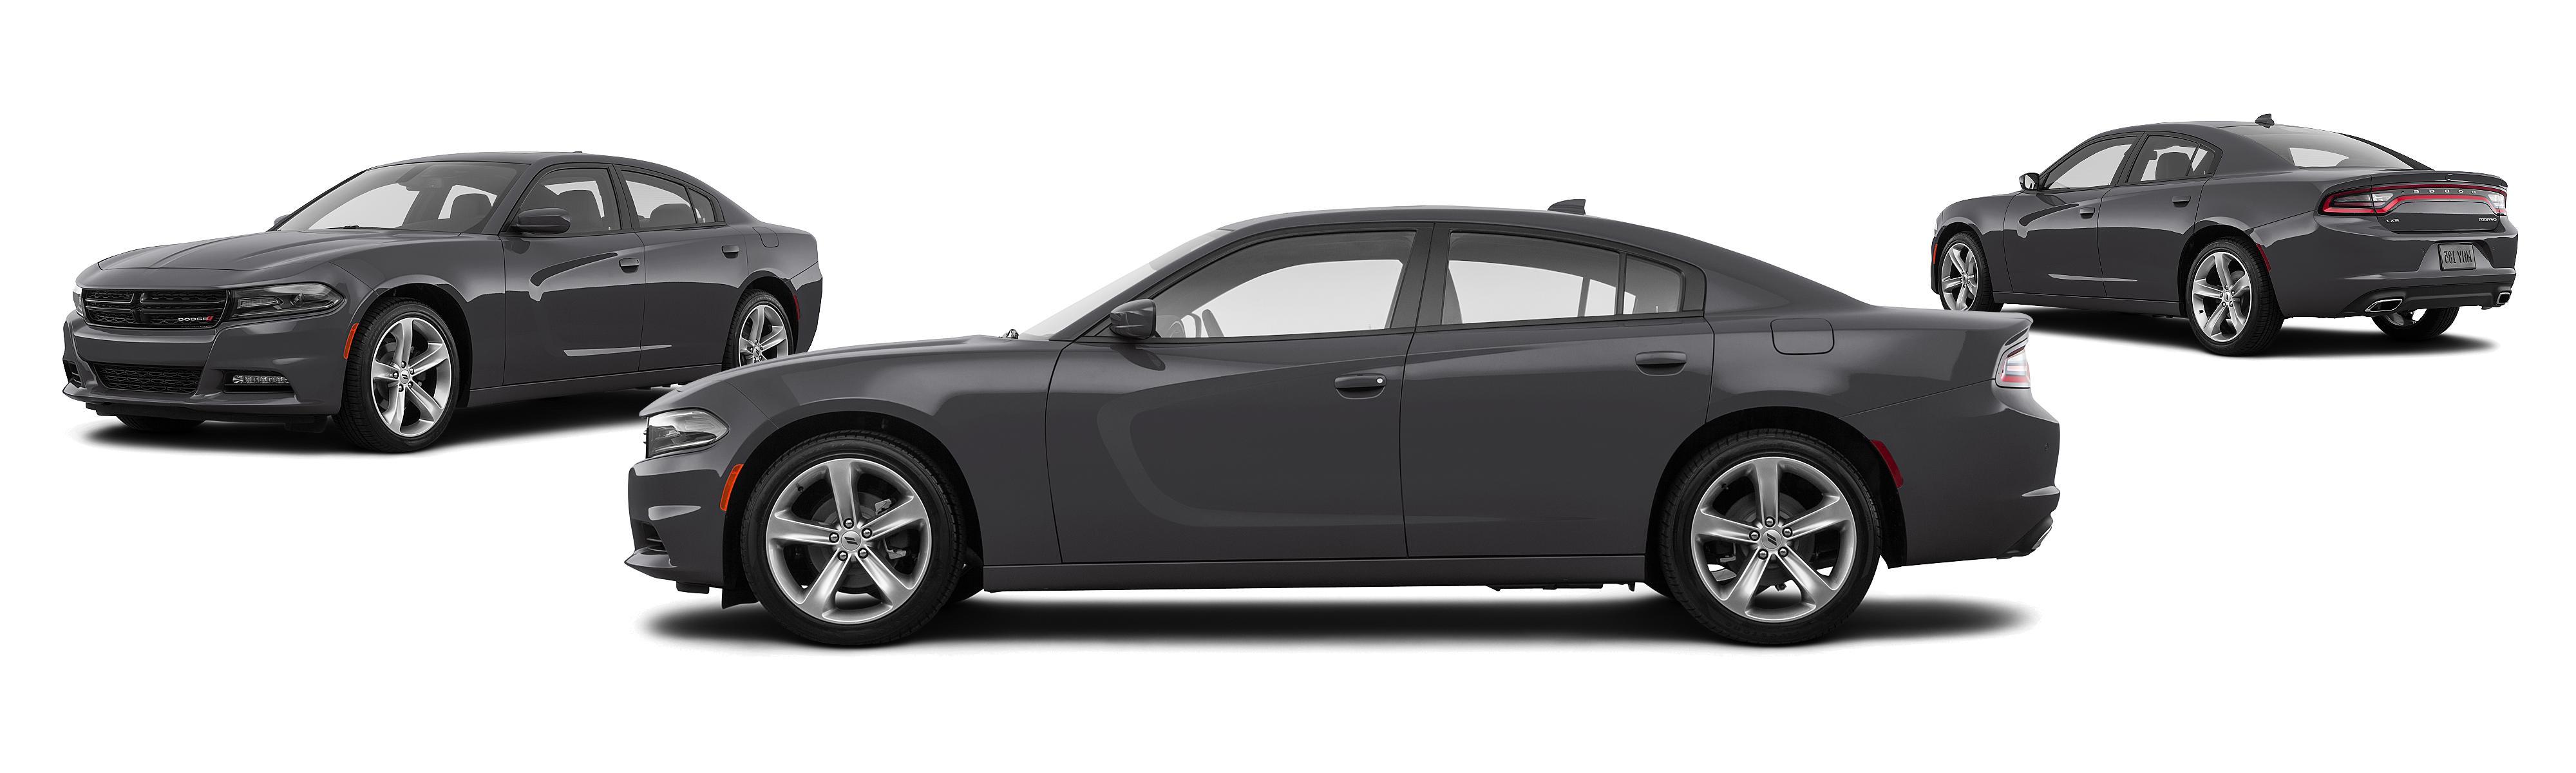 2018 Dodge Charger SRT 392 4dr Sedan Research GrooveCar